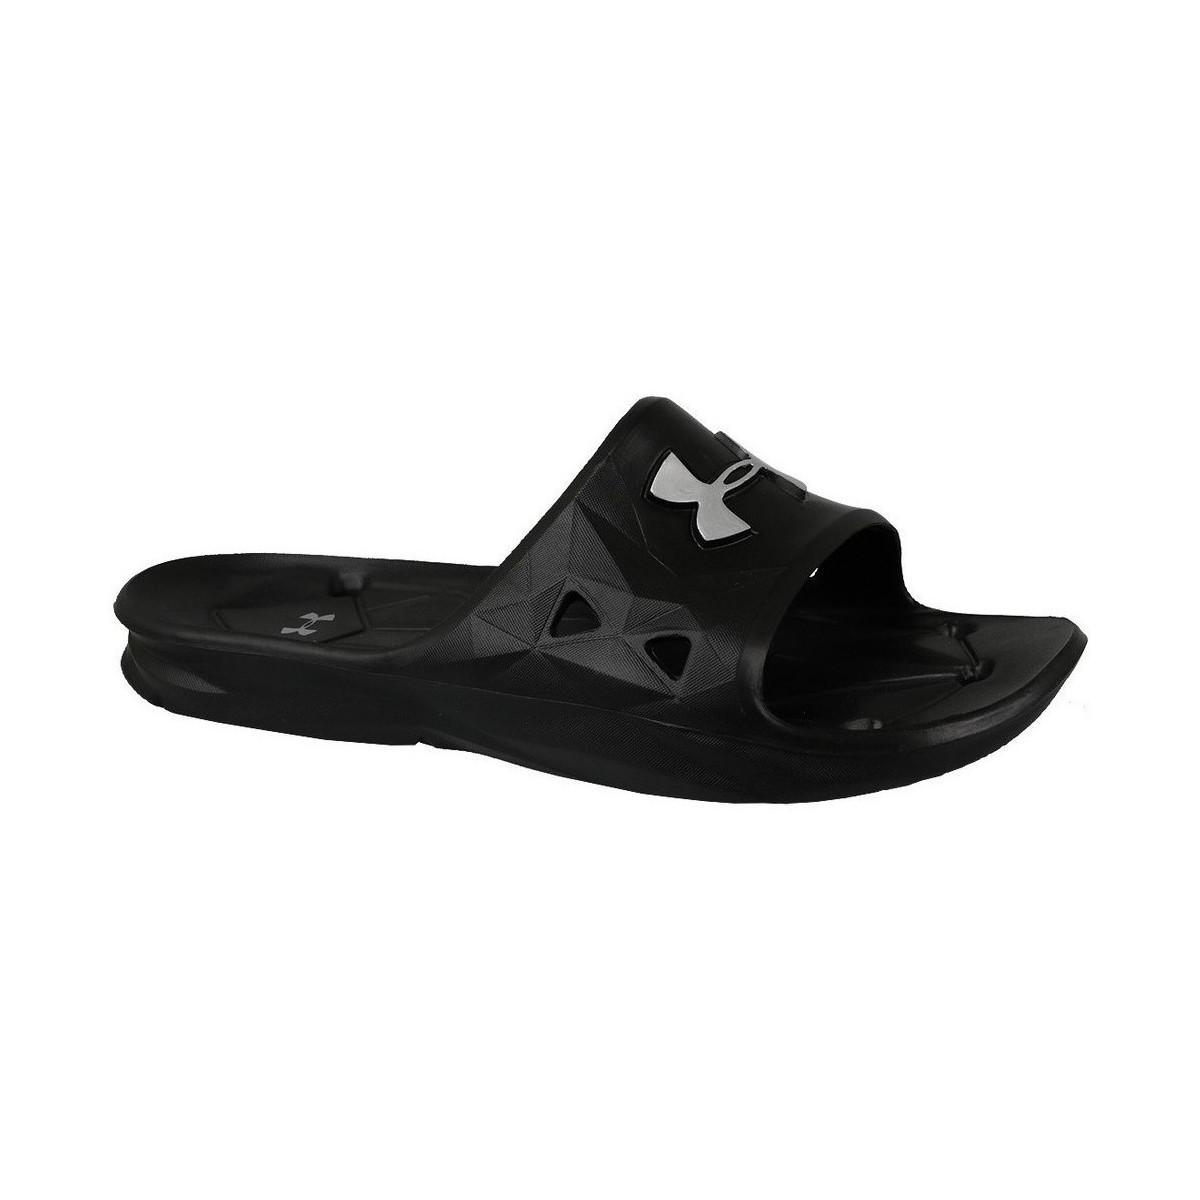 a4b1ff9ca7d Under Armour Locker Iii Sl Men s Sandals In Black in Black for Men ...